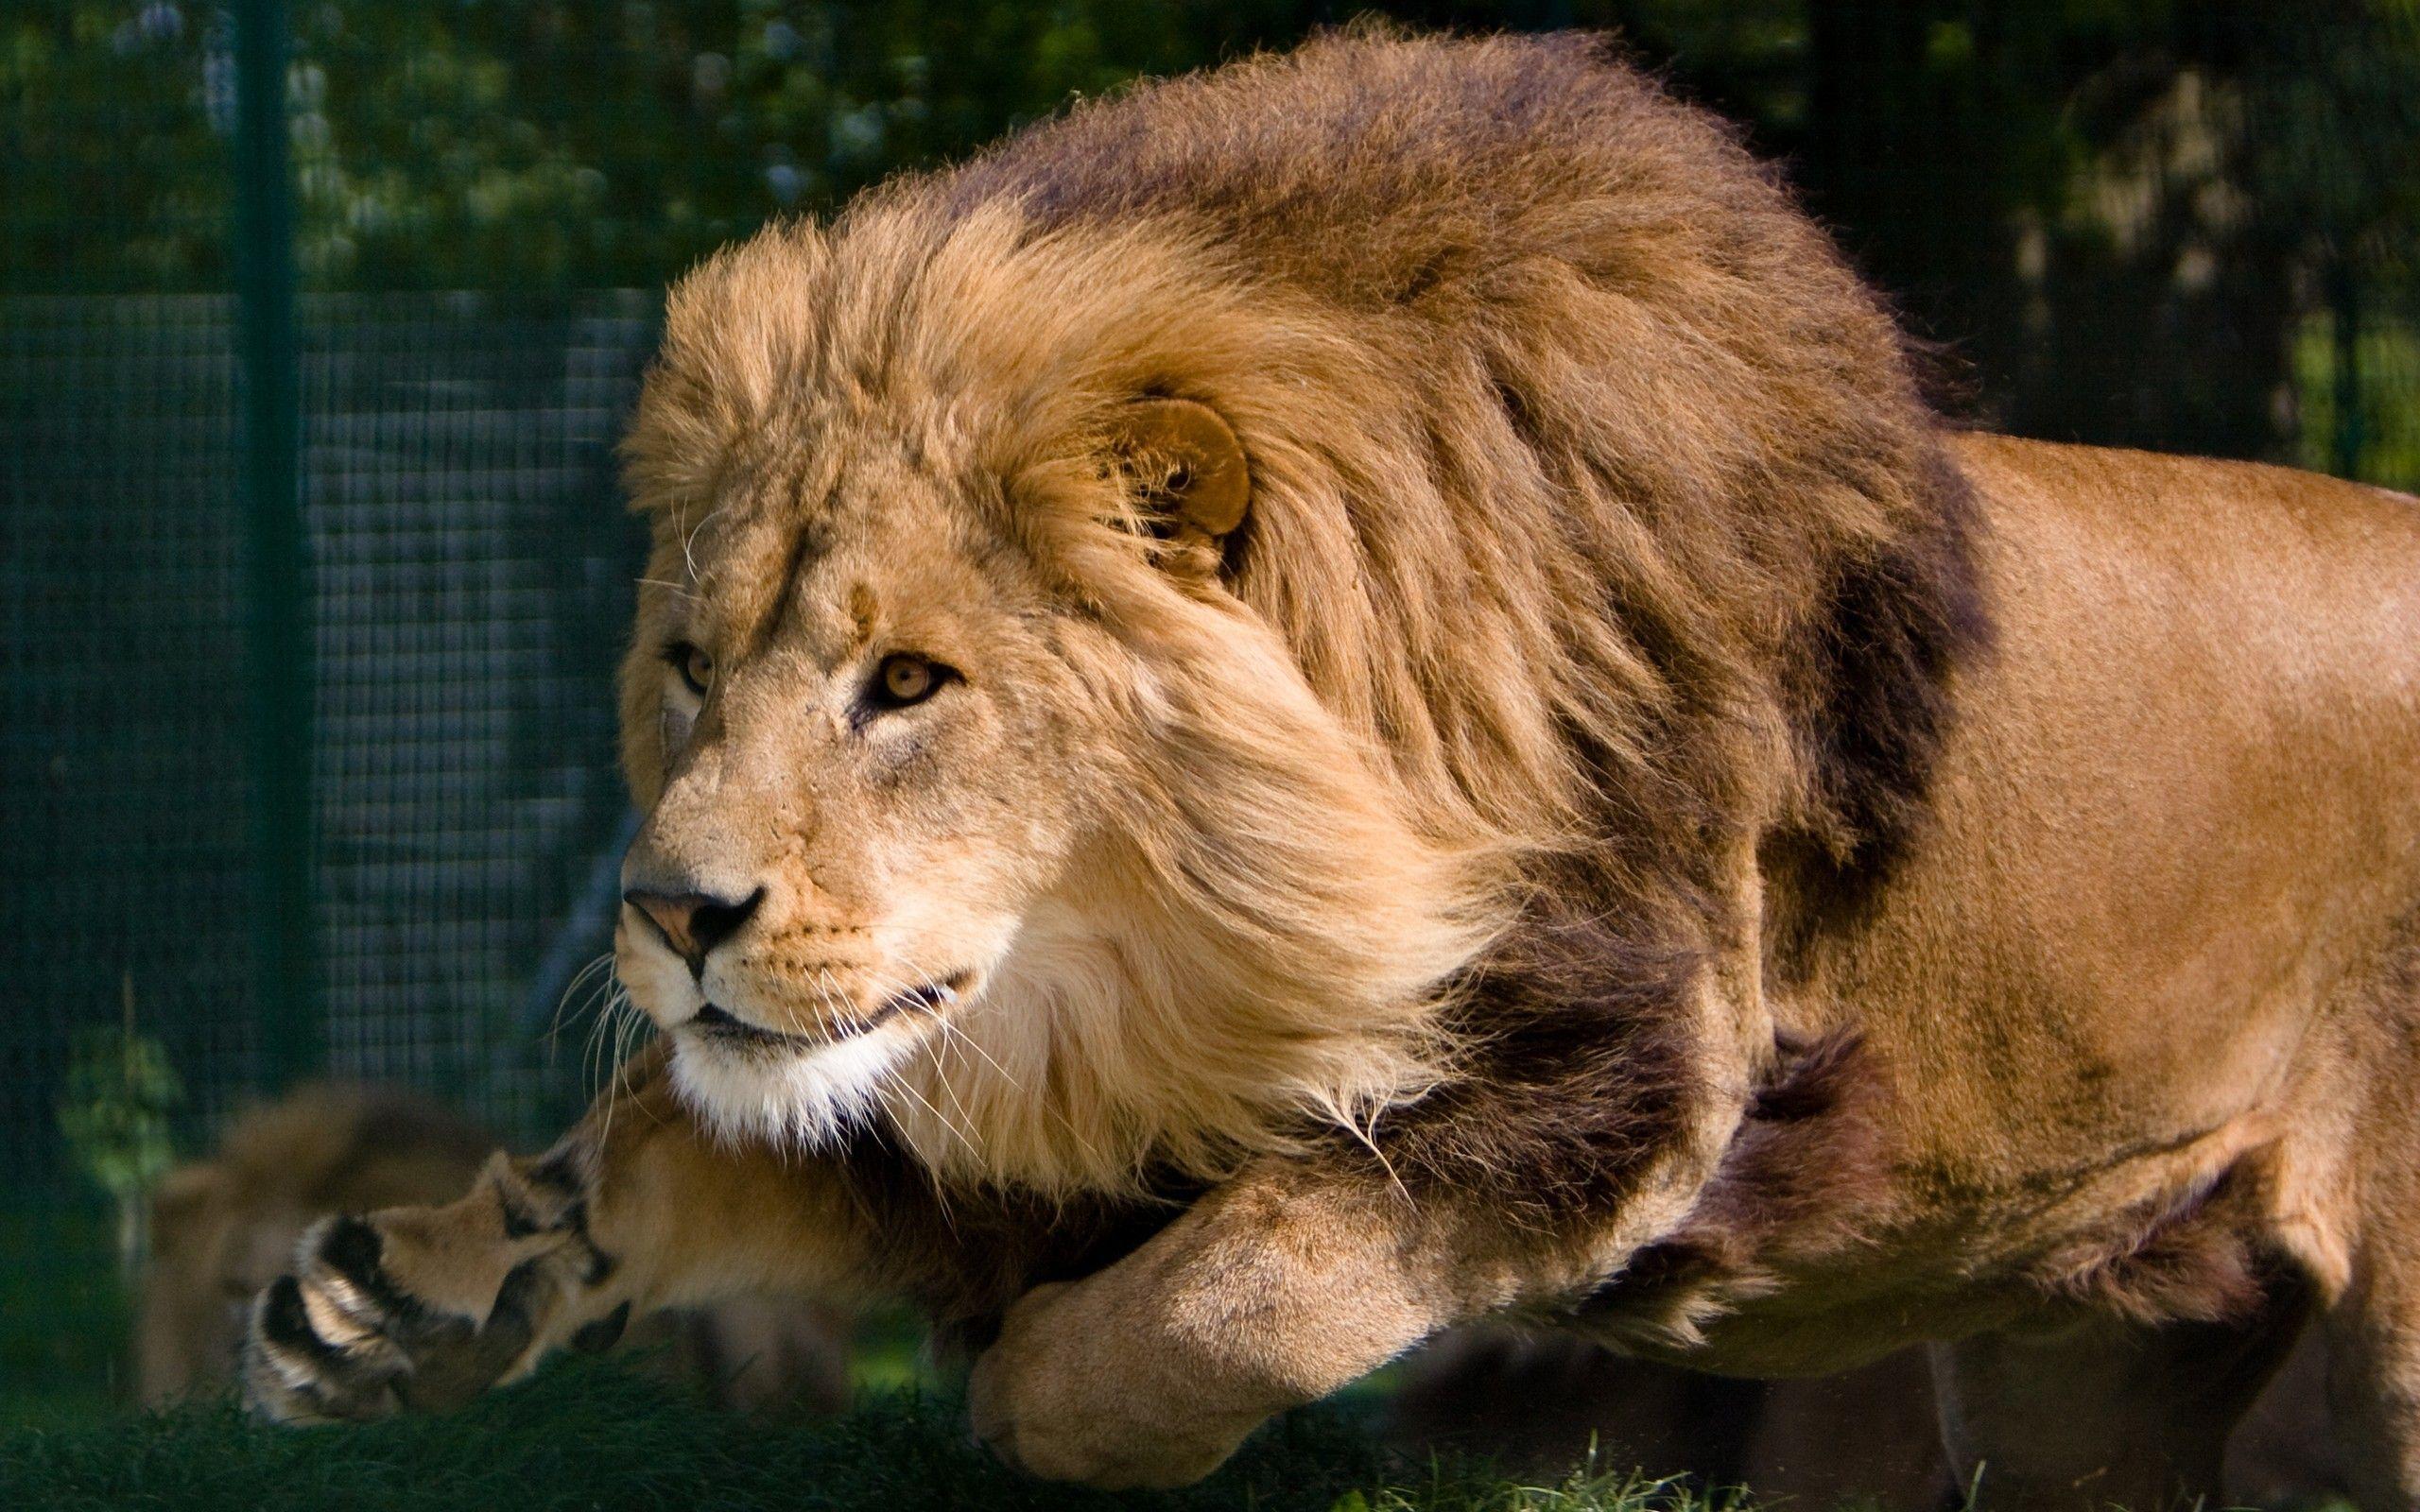 Hd wallpaper lion - Hd Desktop Lion Charging